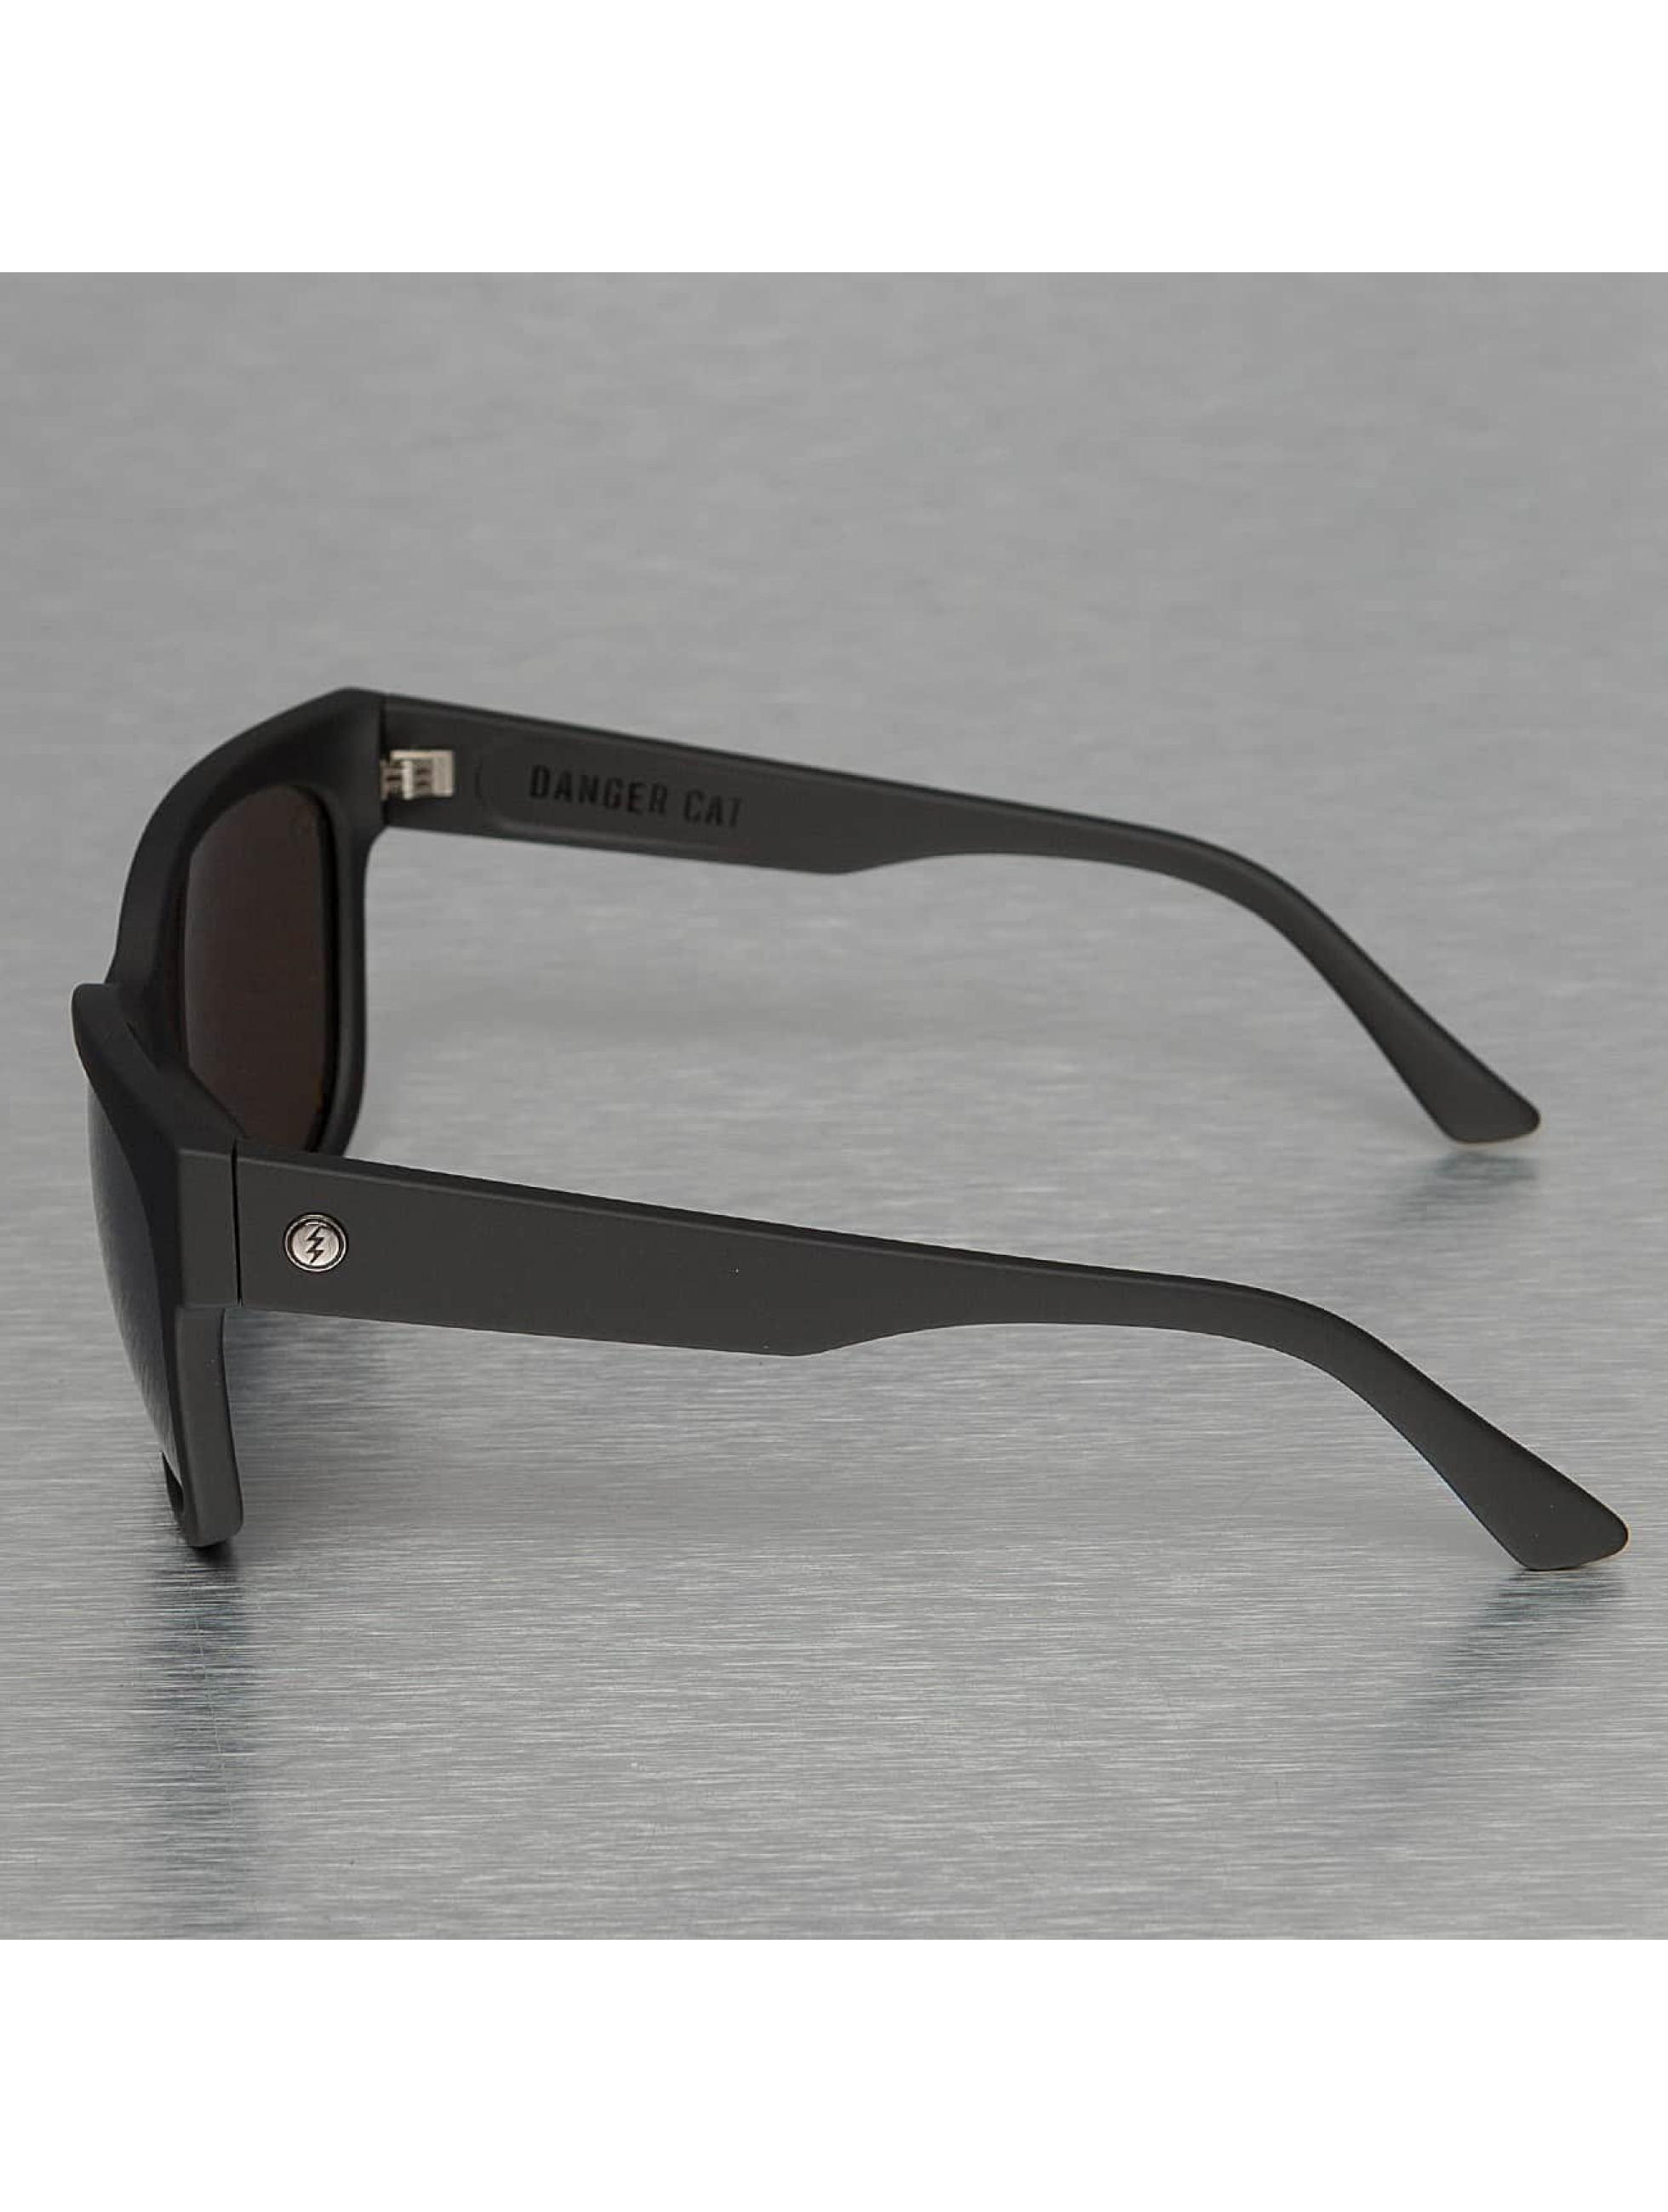 Electric Sunglasses DANGER CAT gray